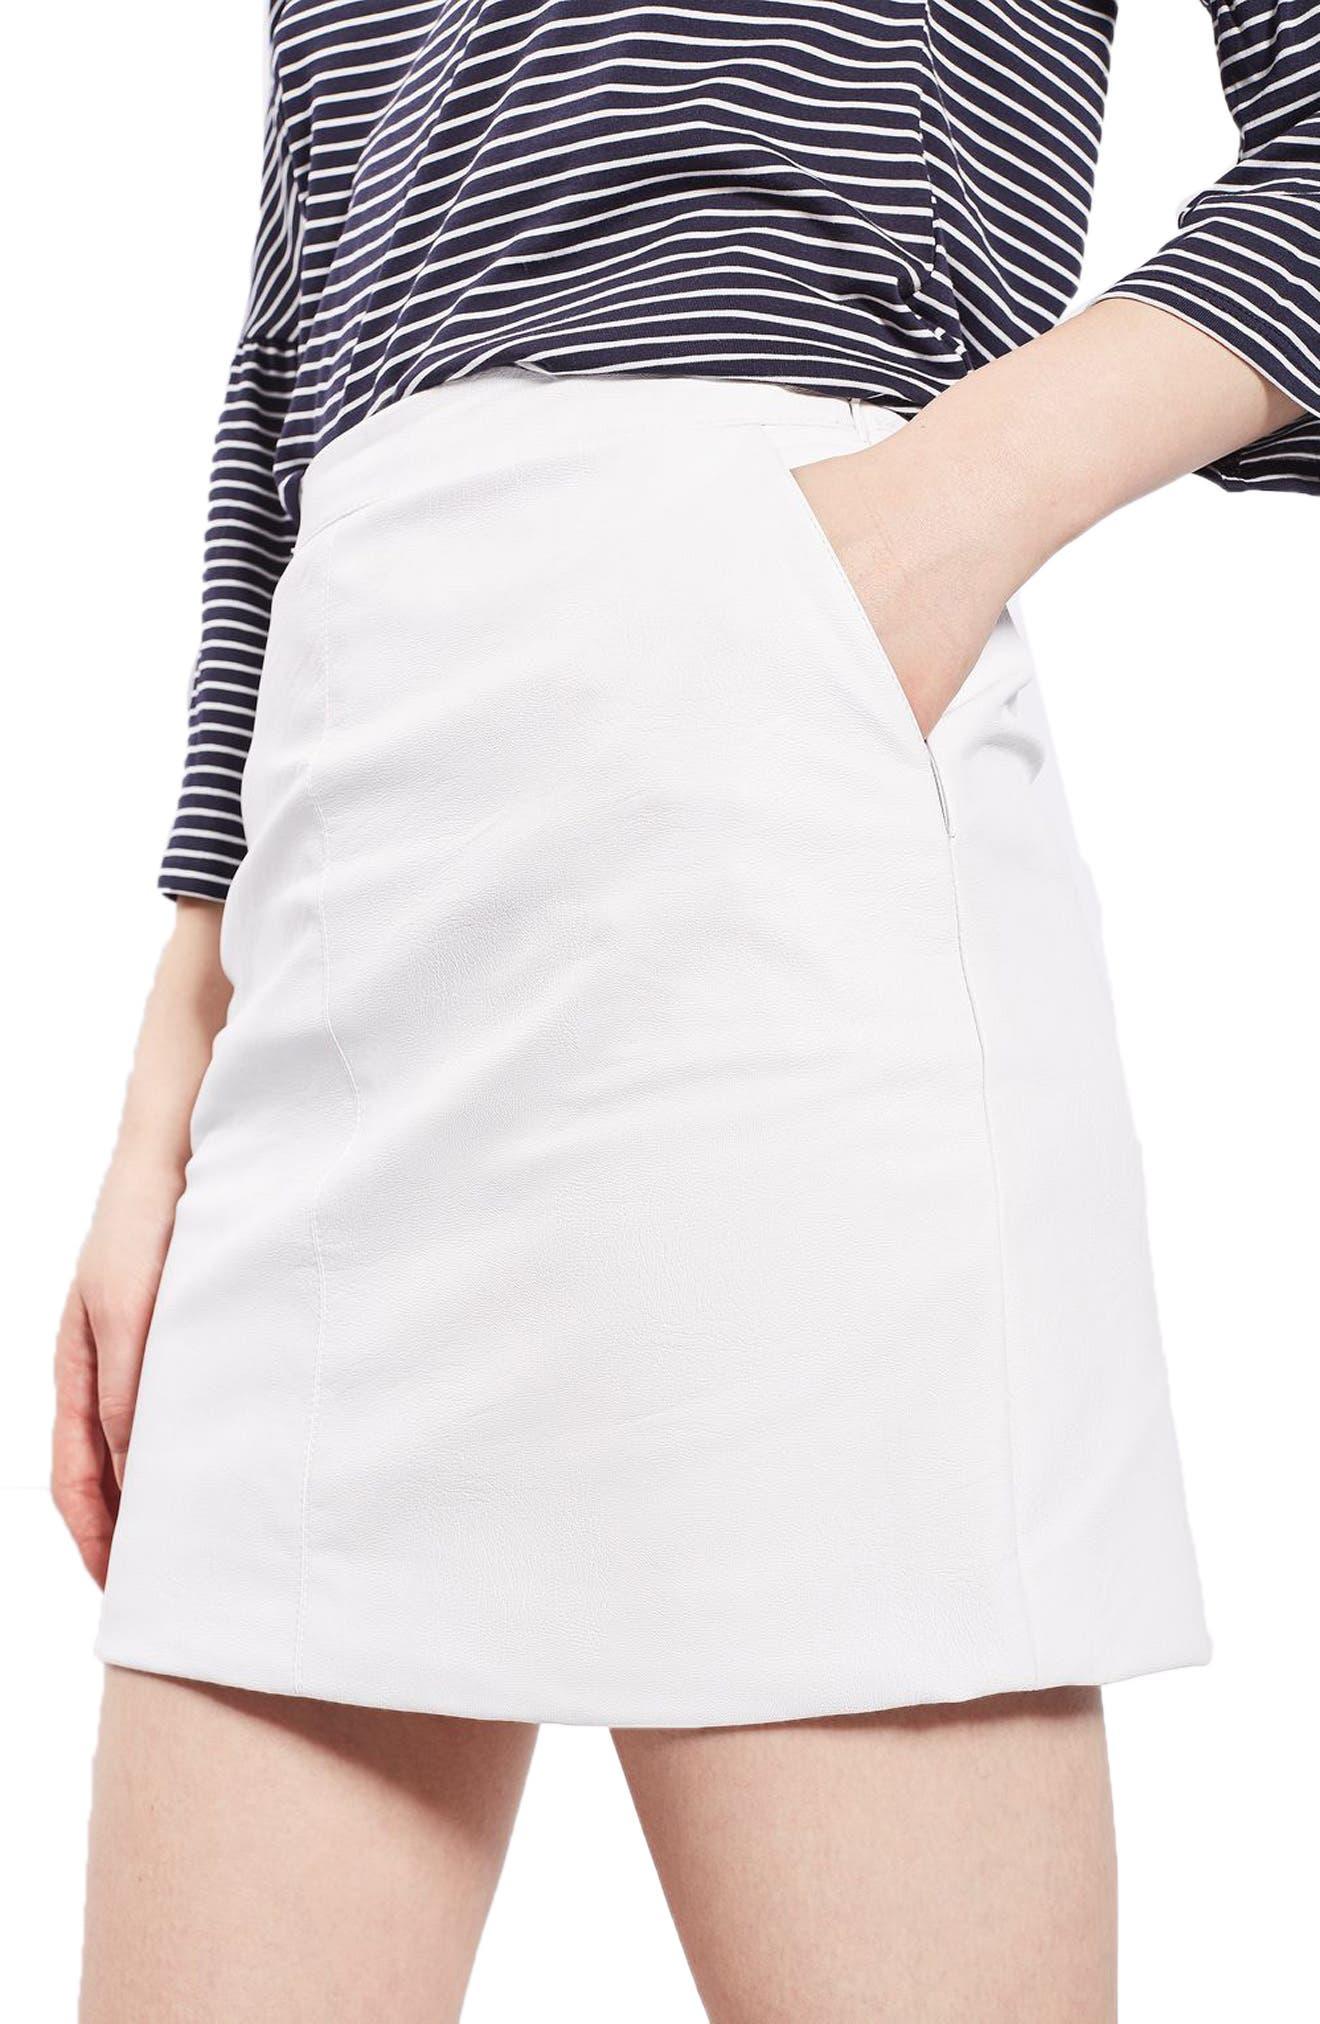 Main Image - Topshop Faux Leather Pencil Skirt (Regular & Petite)